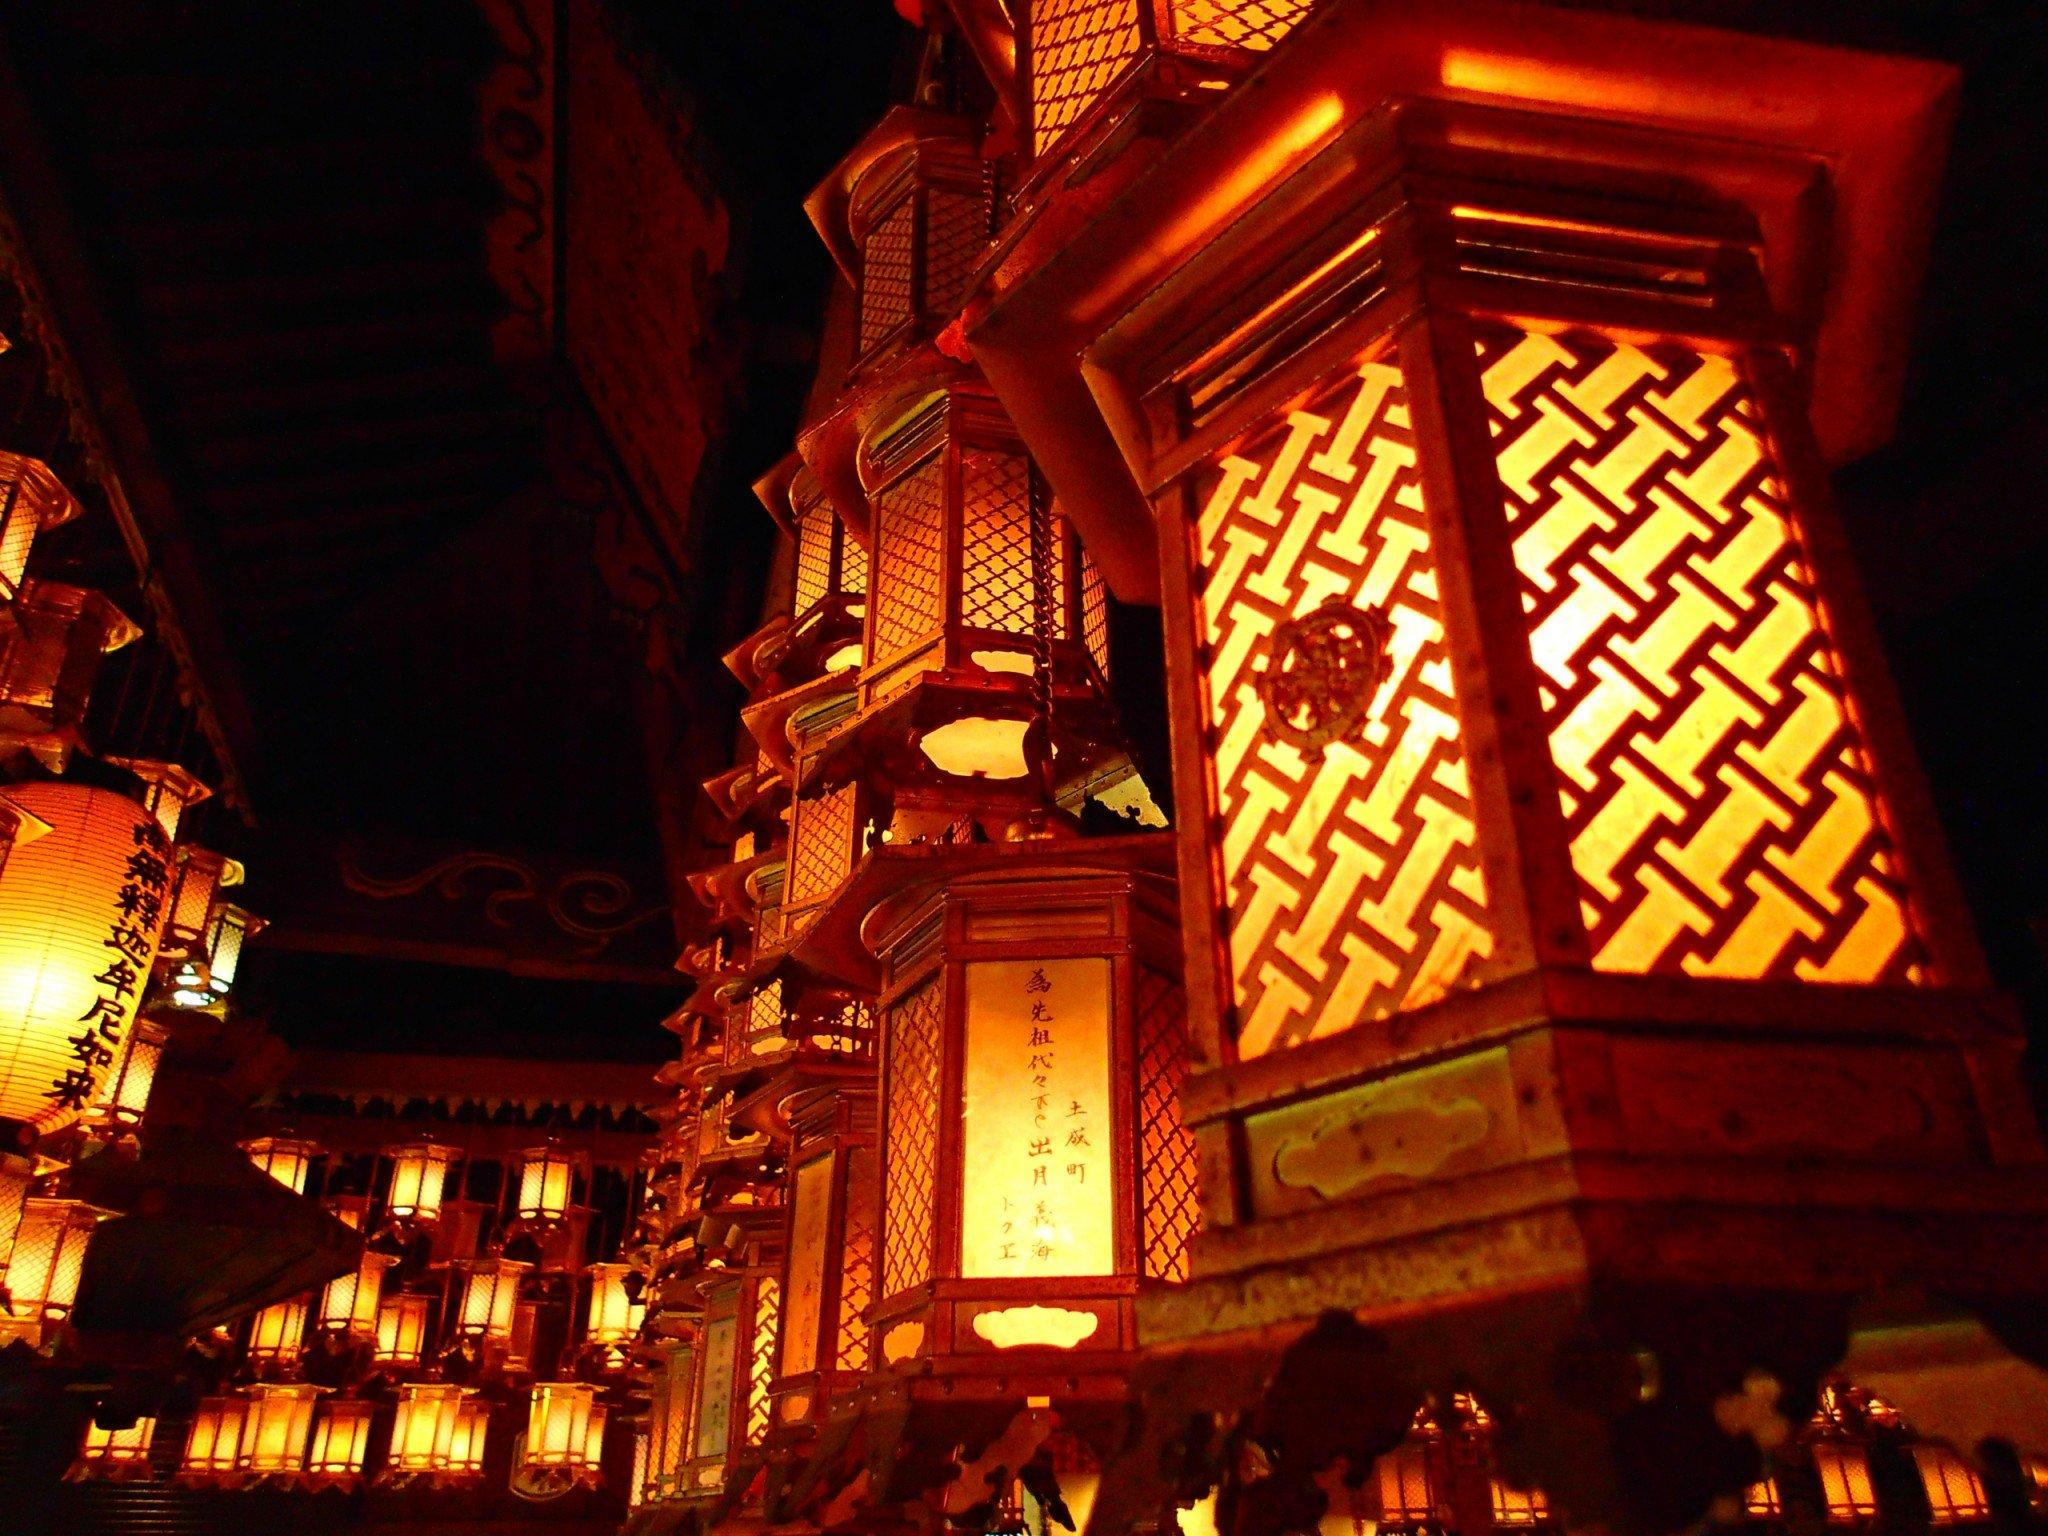 Ryozen-ji, der erste Tempel auf dem 88 Tempel Pilgerweg.